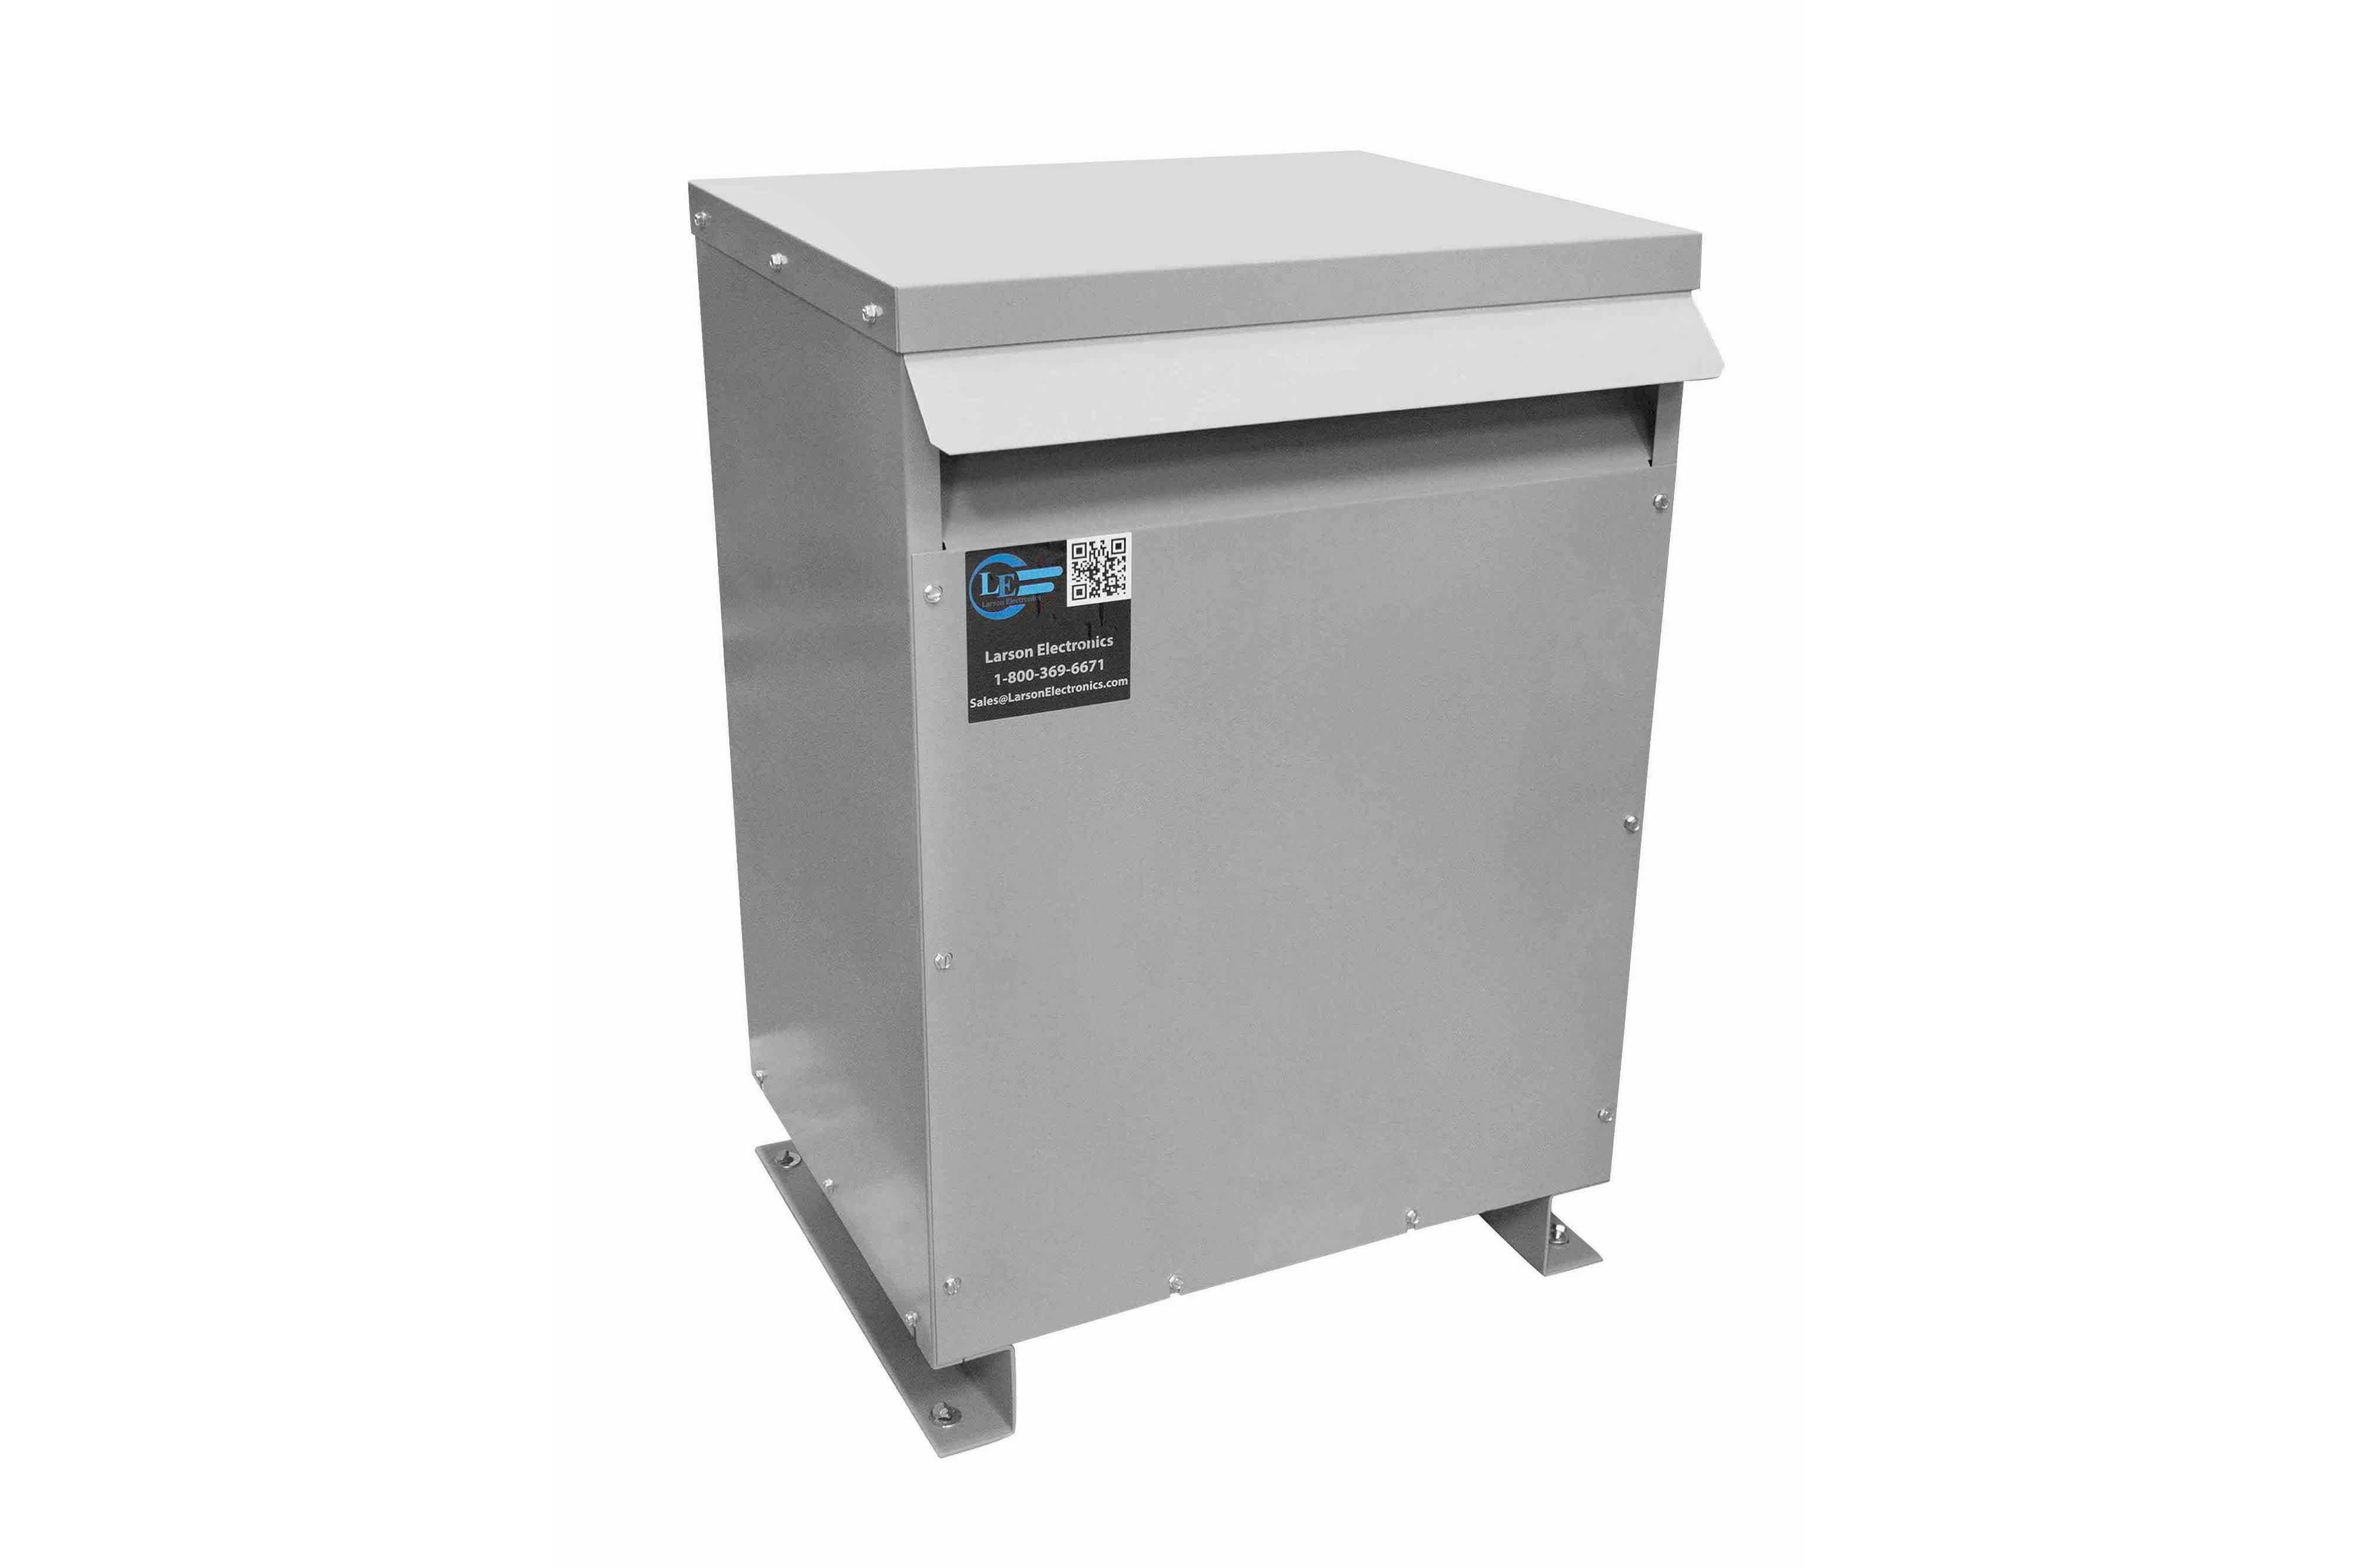 12 kVA 3PH DOE Transformer, 575V Delta Primary, 208Y/120 Wye-N Secondary, N3R, Ventilated, 60 Hz